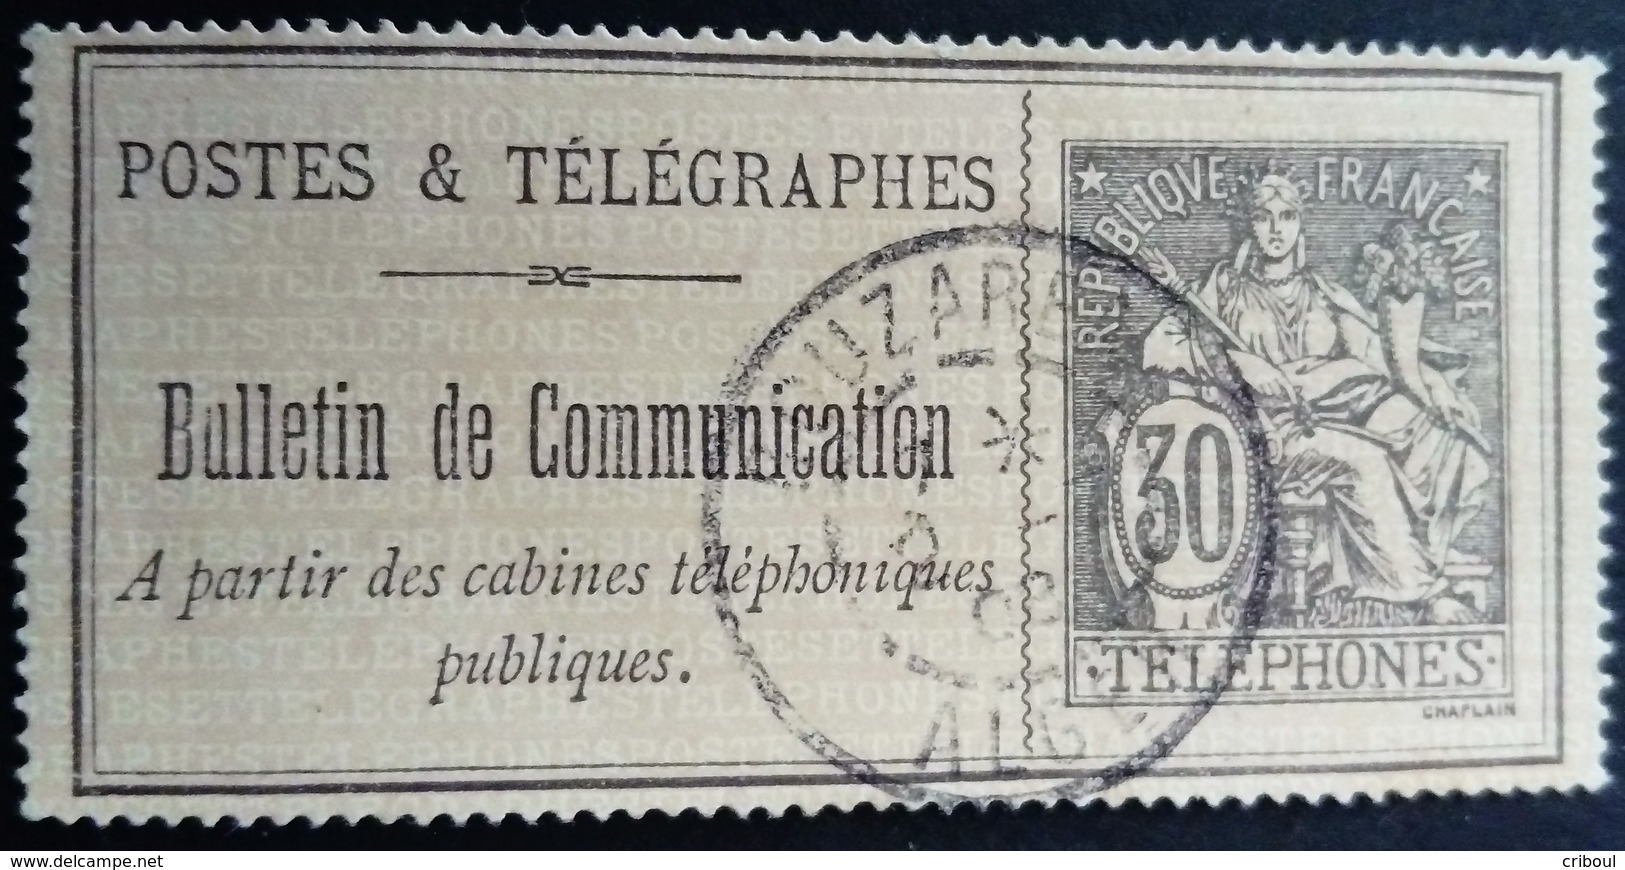 France 1897 Timbre Télégraphe Yvert 17 O Used - Telegraphie Und Telefon